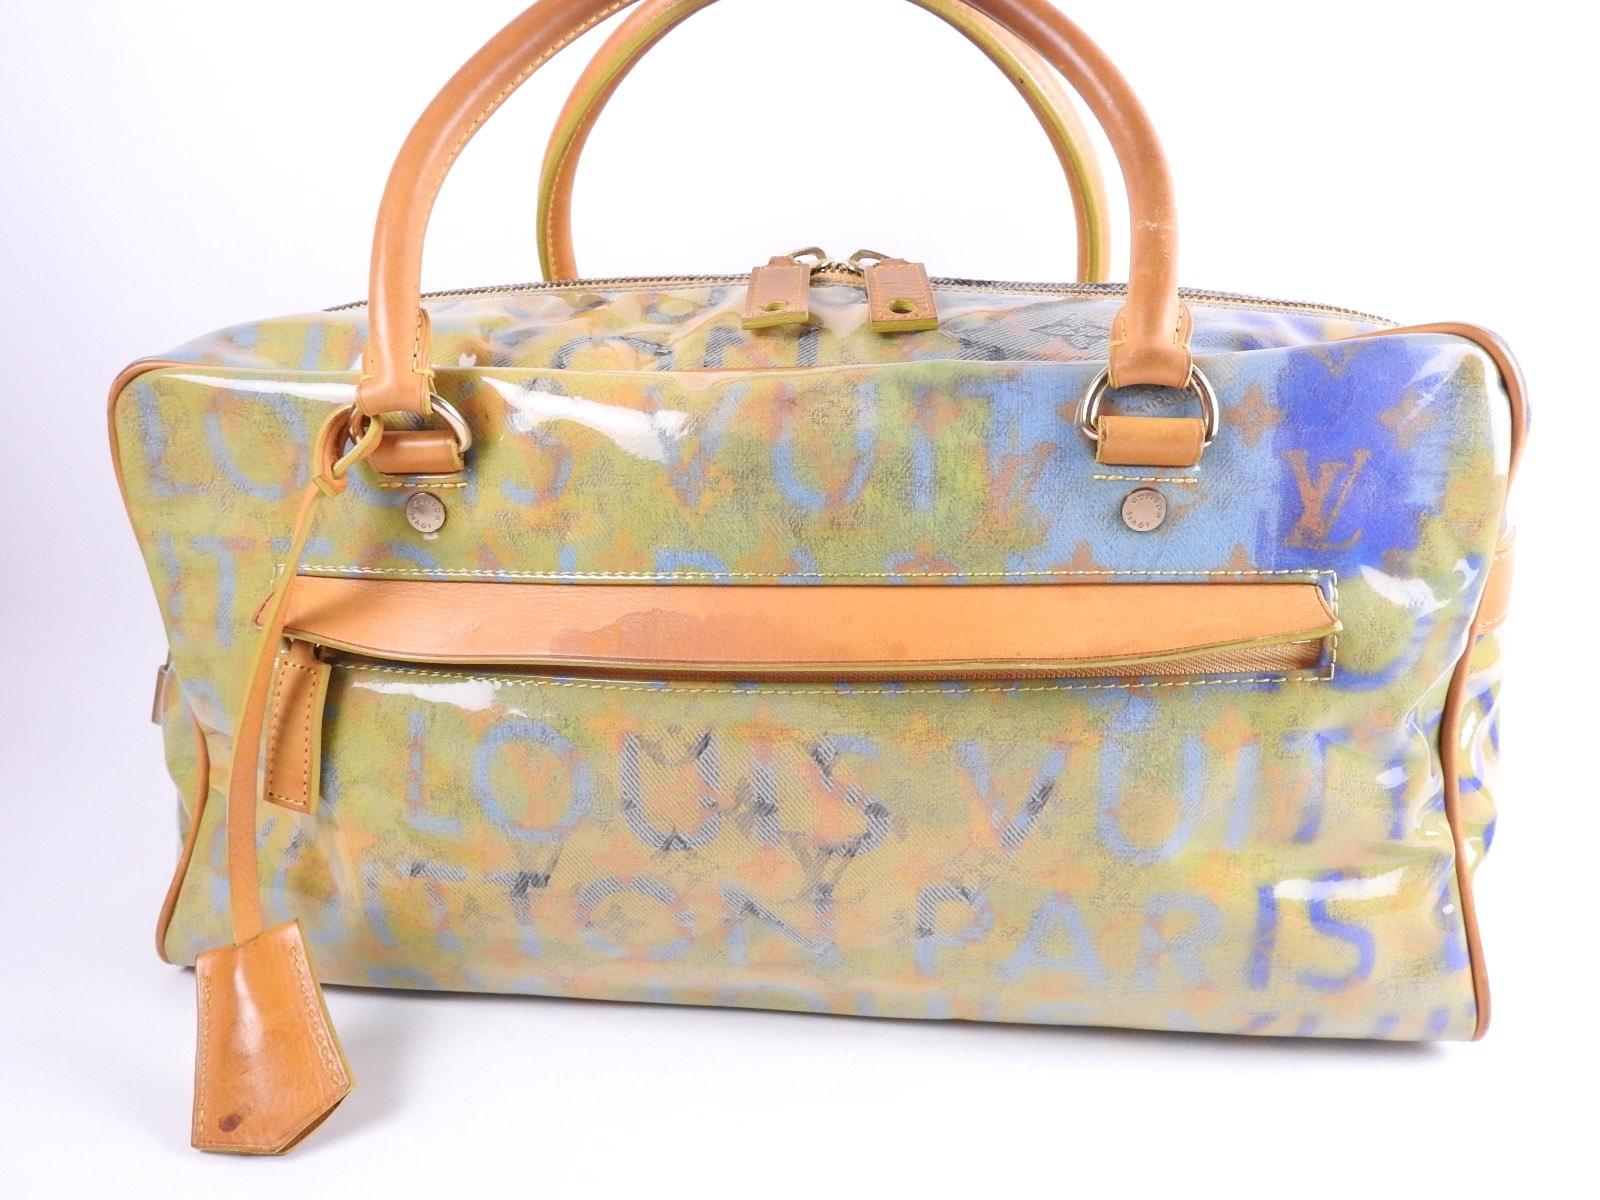 Qoo10 - Louis Vuitton Monogram pulp Weekender GM Boston bag ... 240251f7fa41b